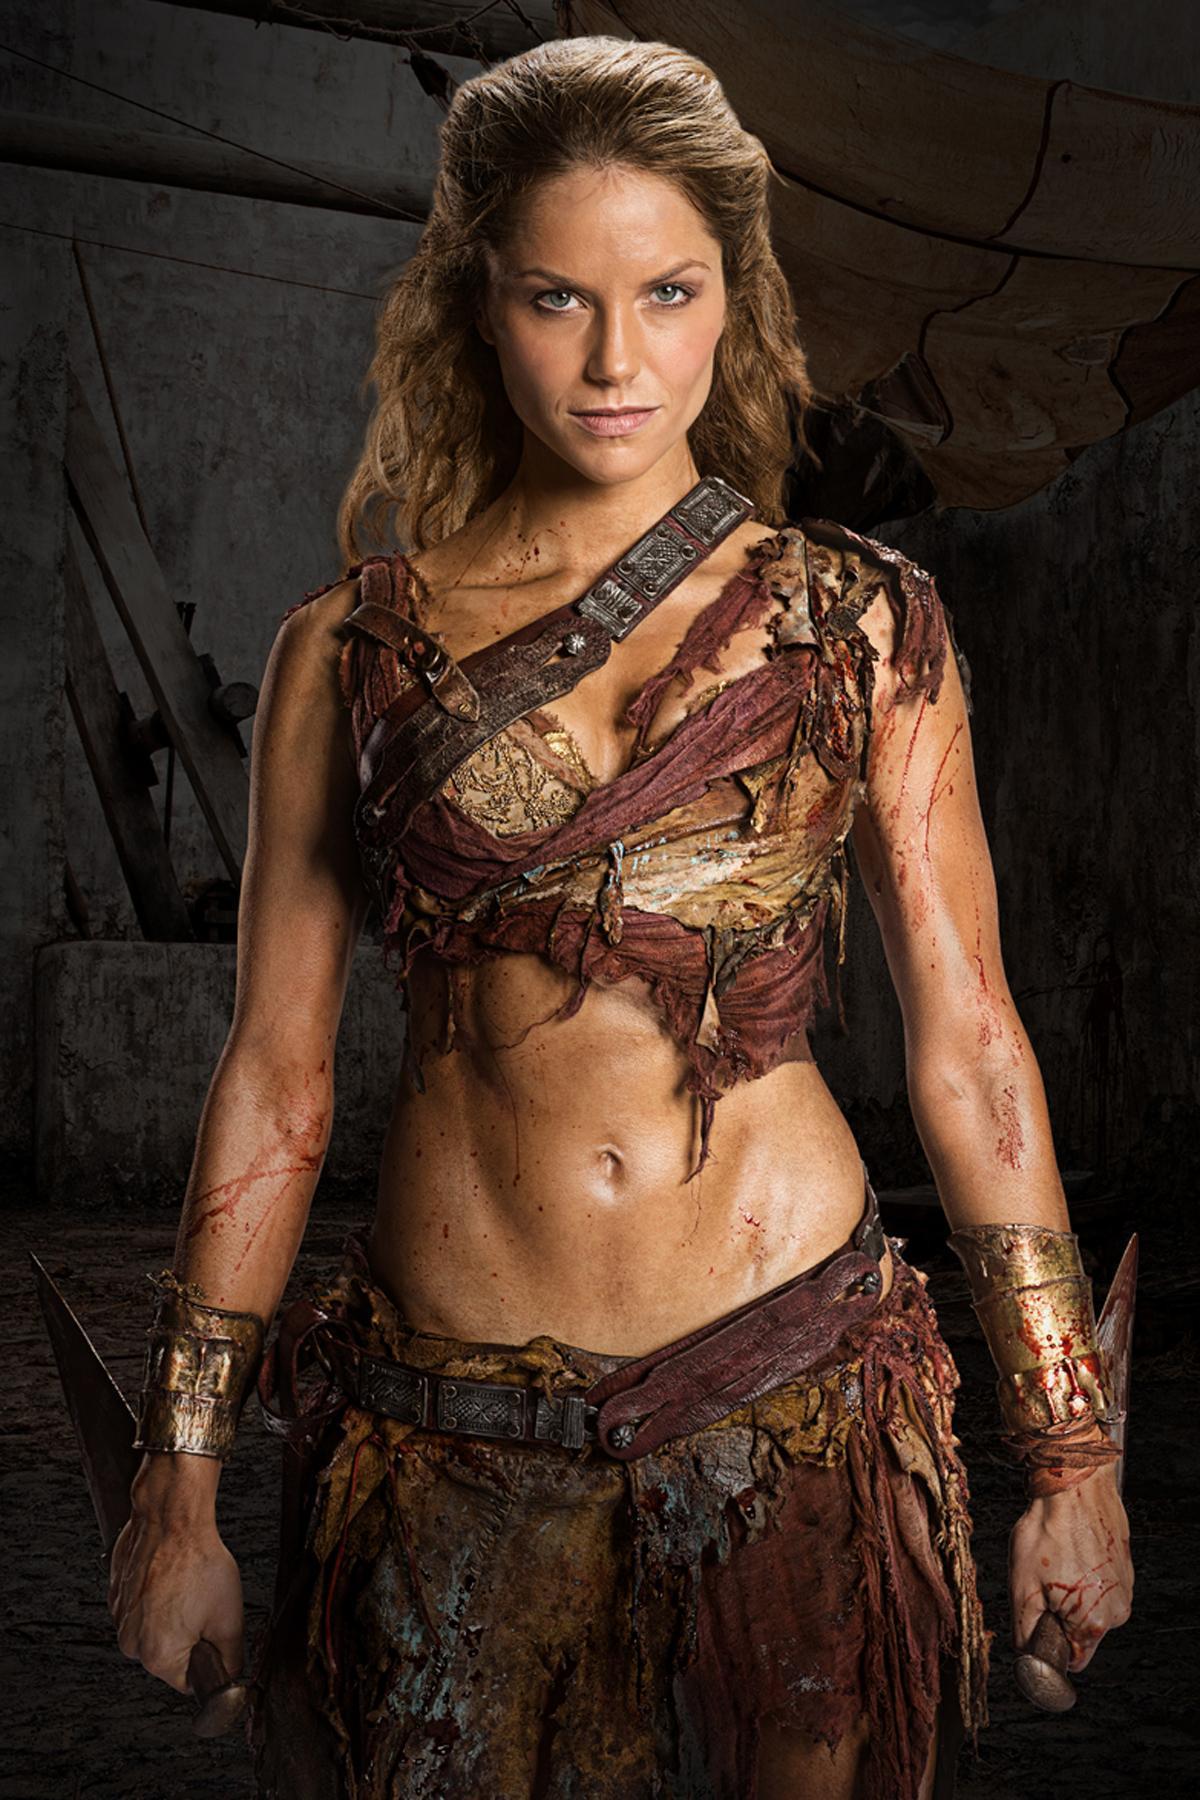 Gladiator eroticvs the lesbian warriors adult videos